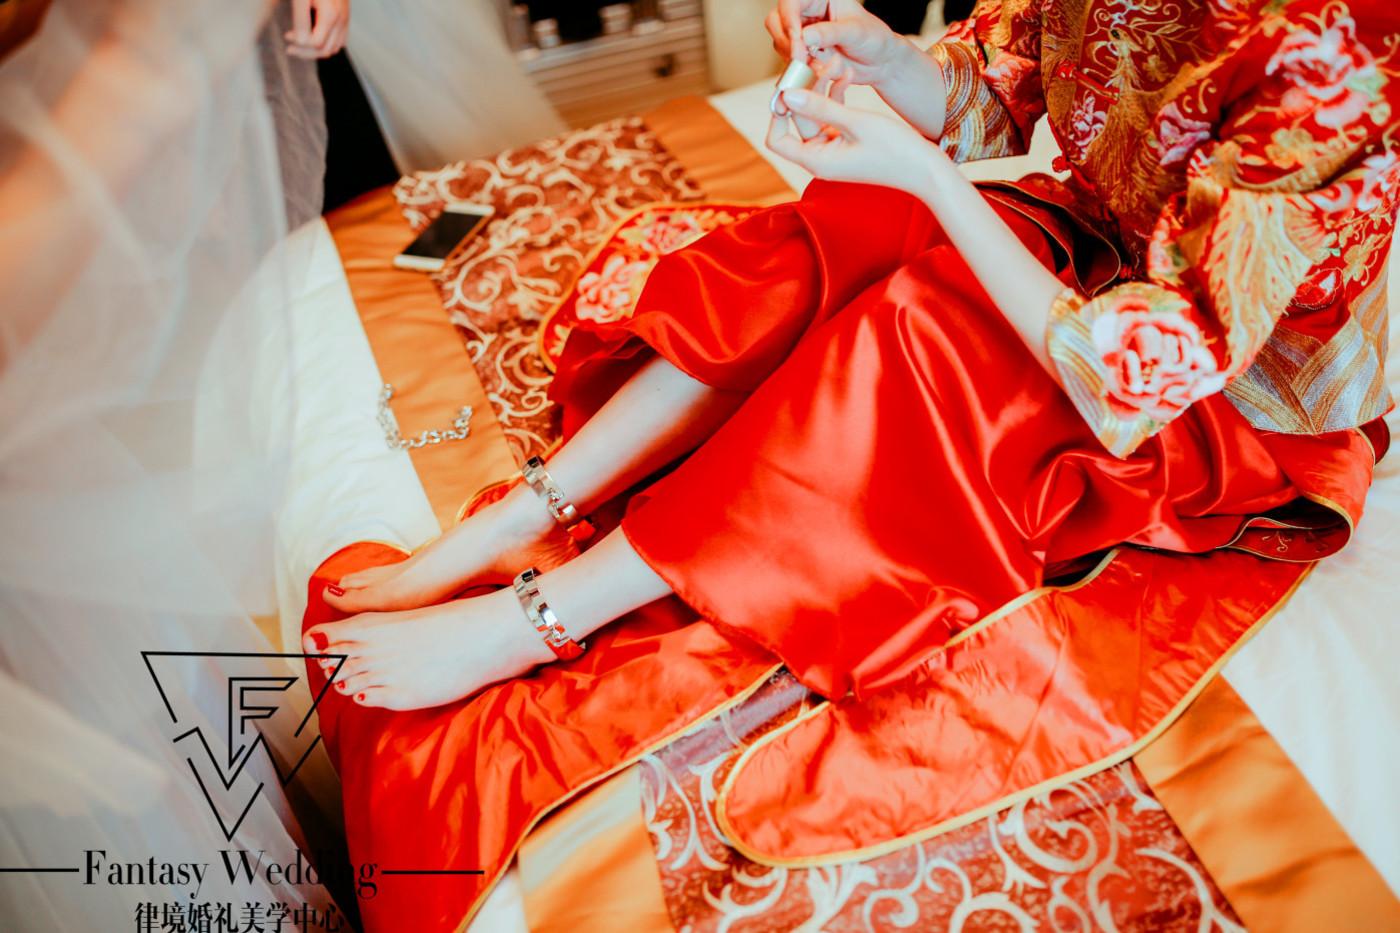 「Fantasy Wedding」& A/P 南艳湖8